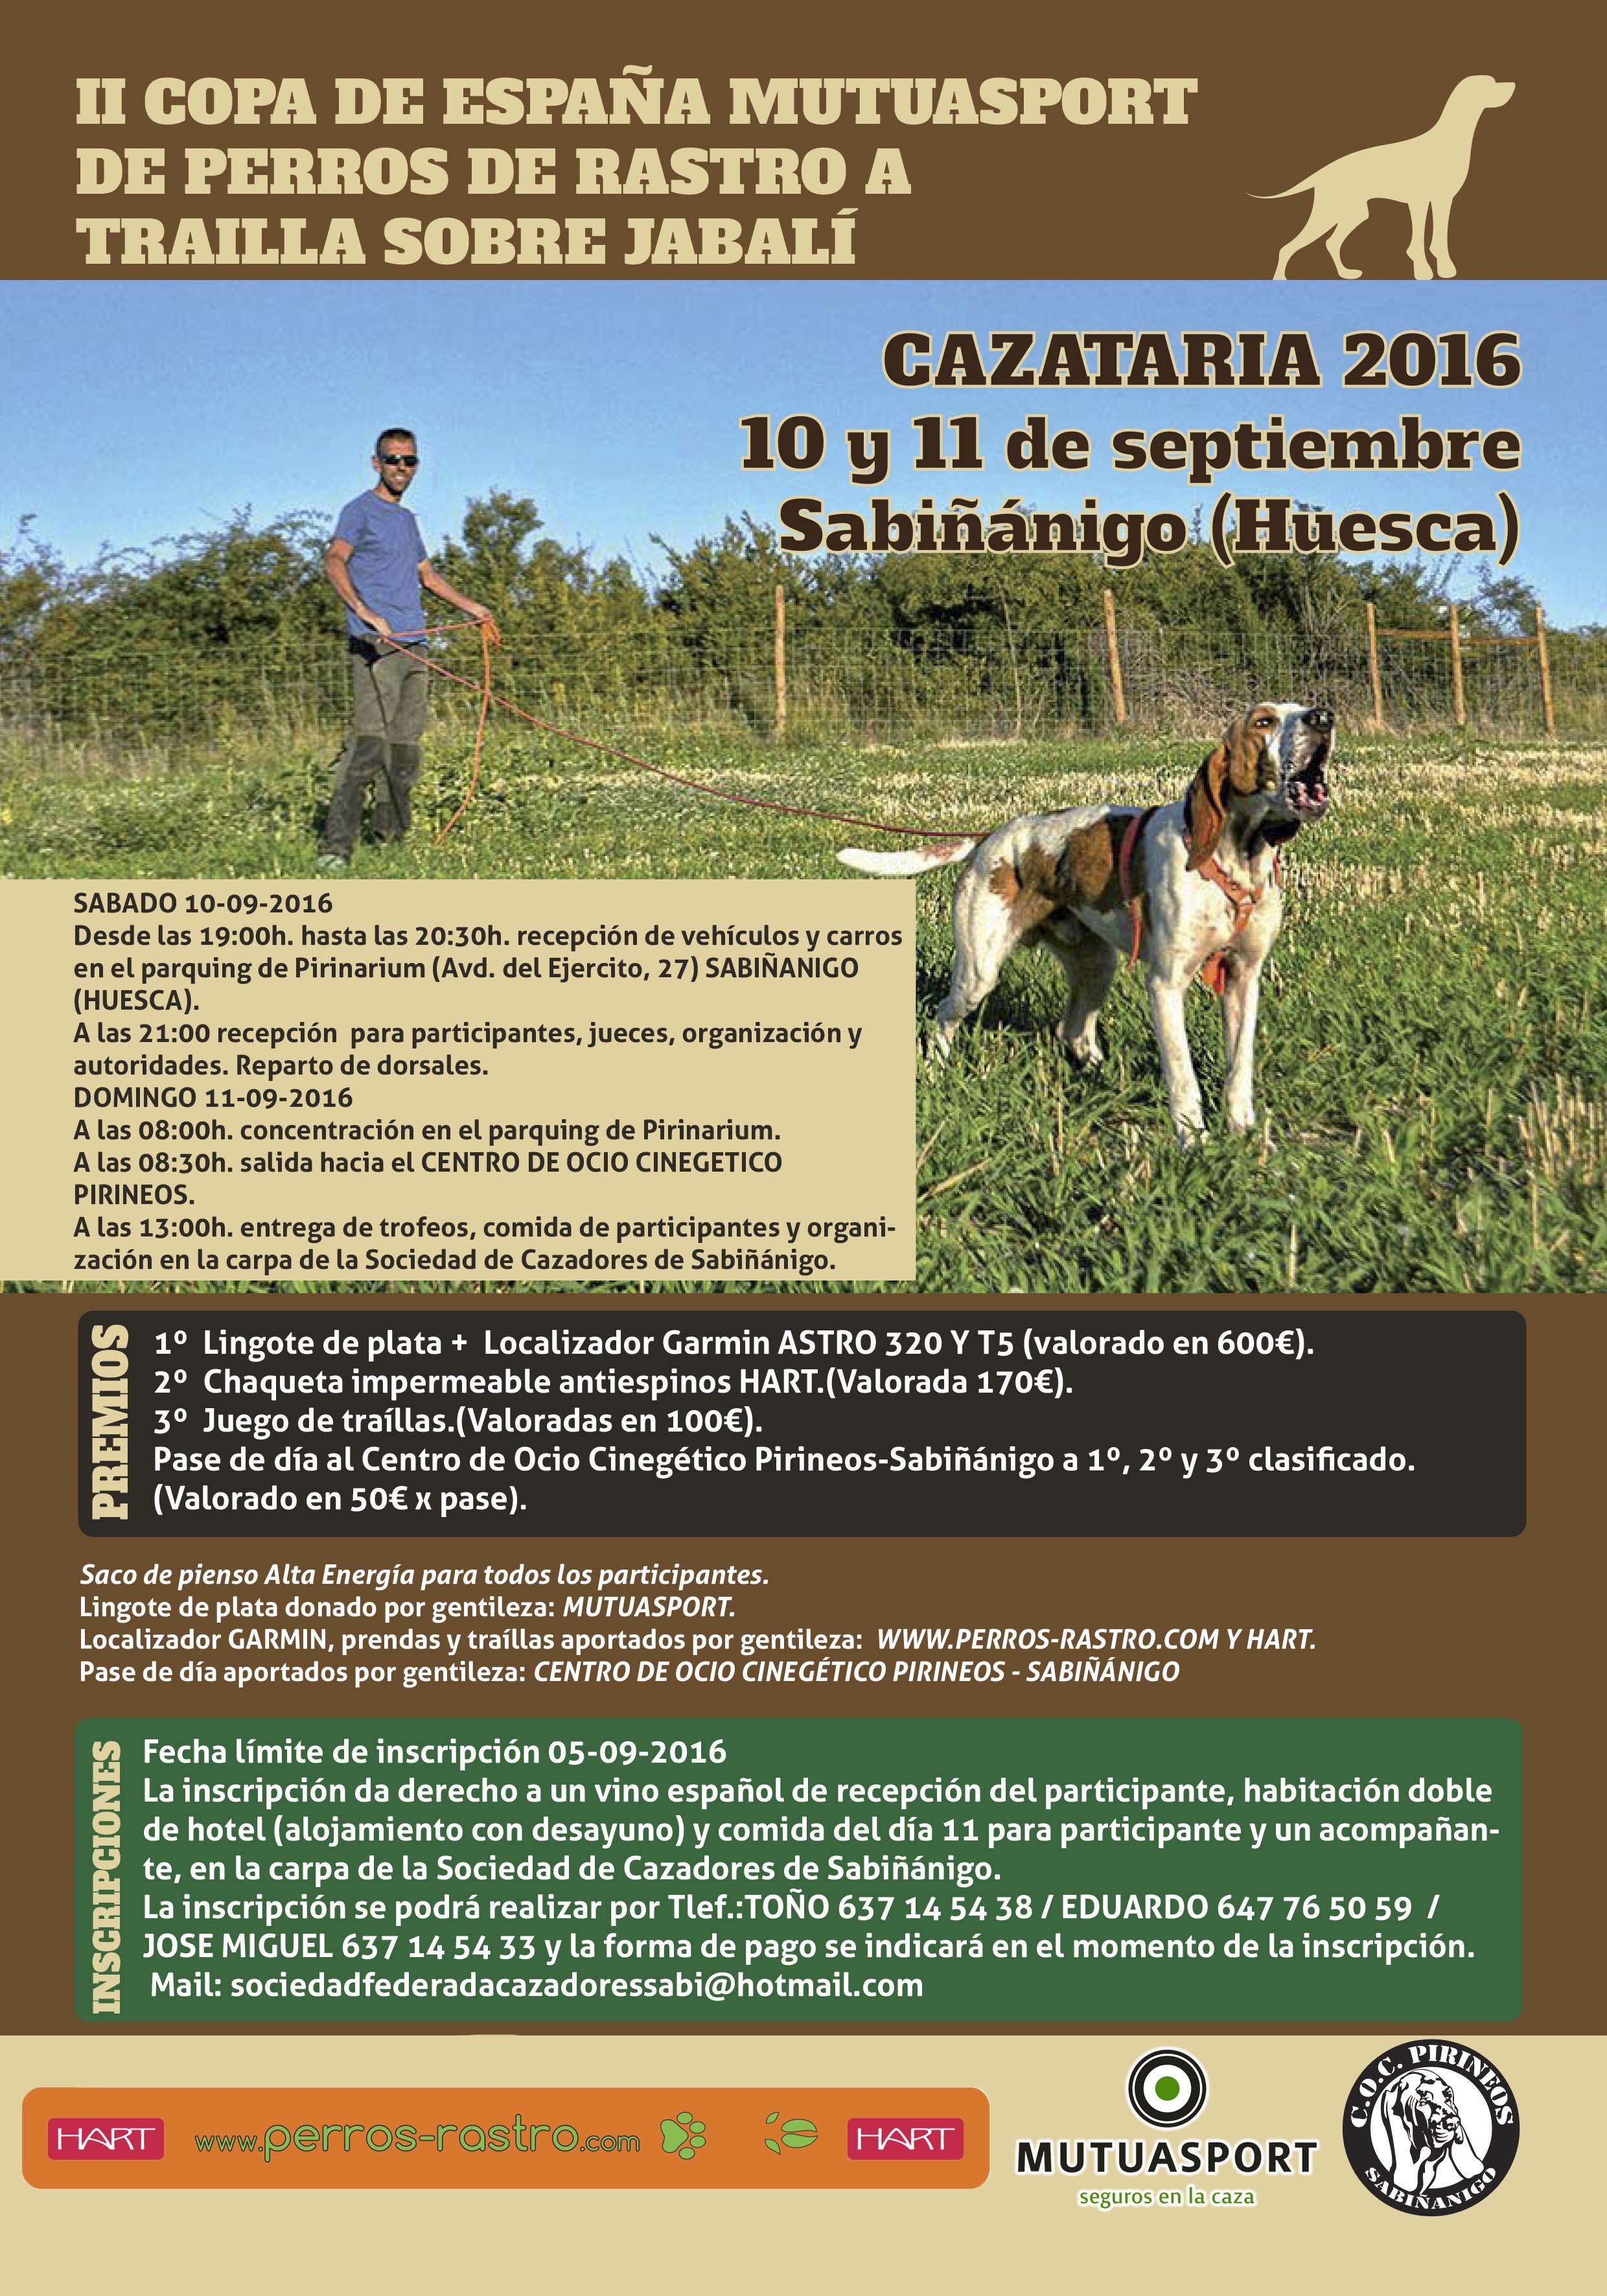 II Copa de España Mutuasport de perros de rastro a traílla sobre jabalí